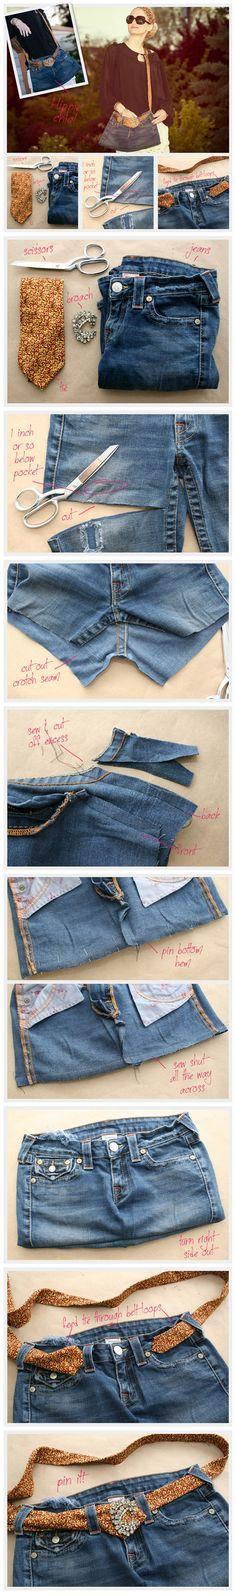 DIY Recycled Jeans Bag Tutorial